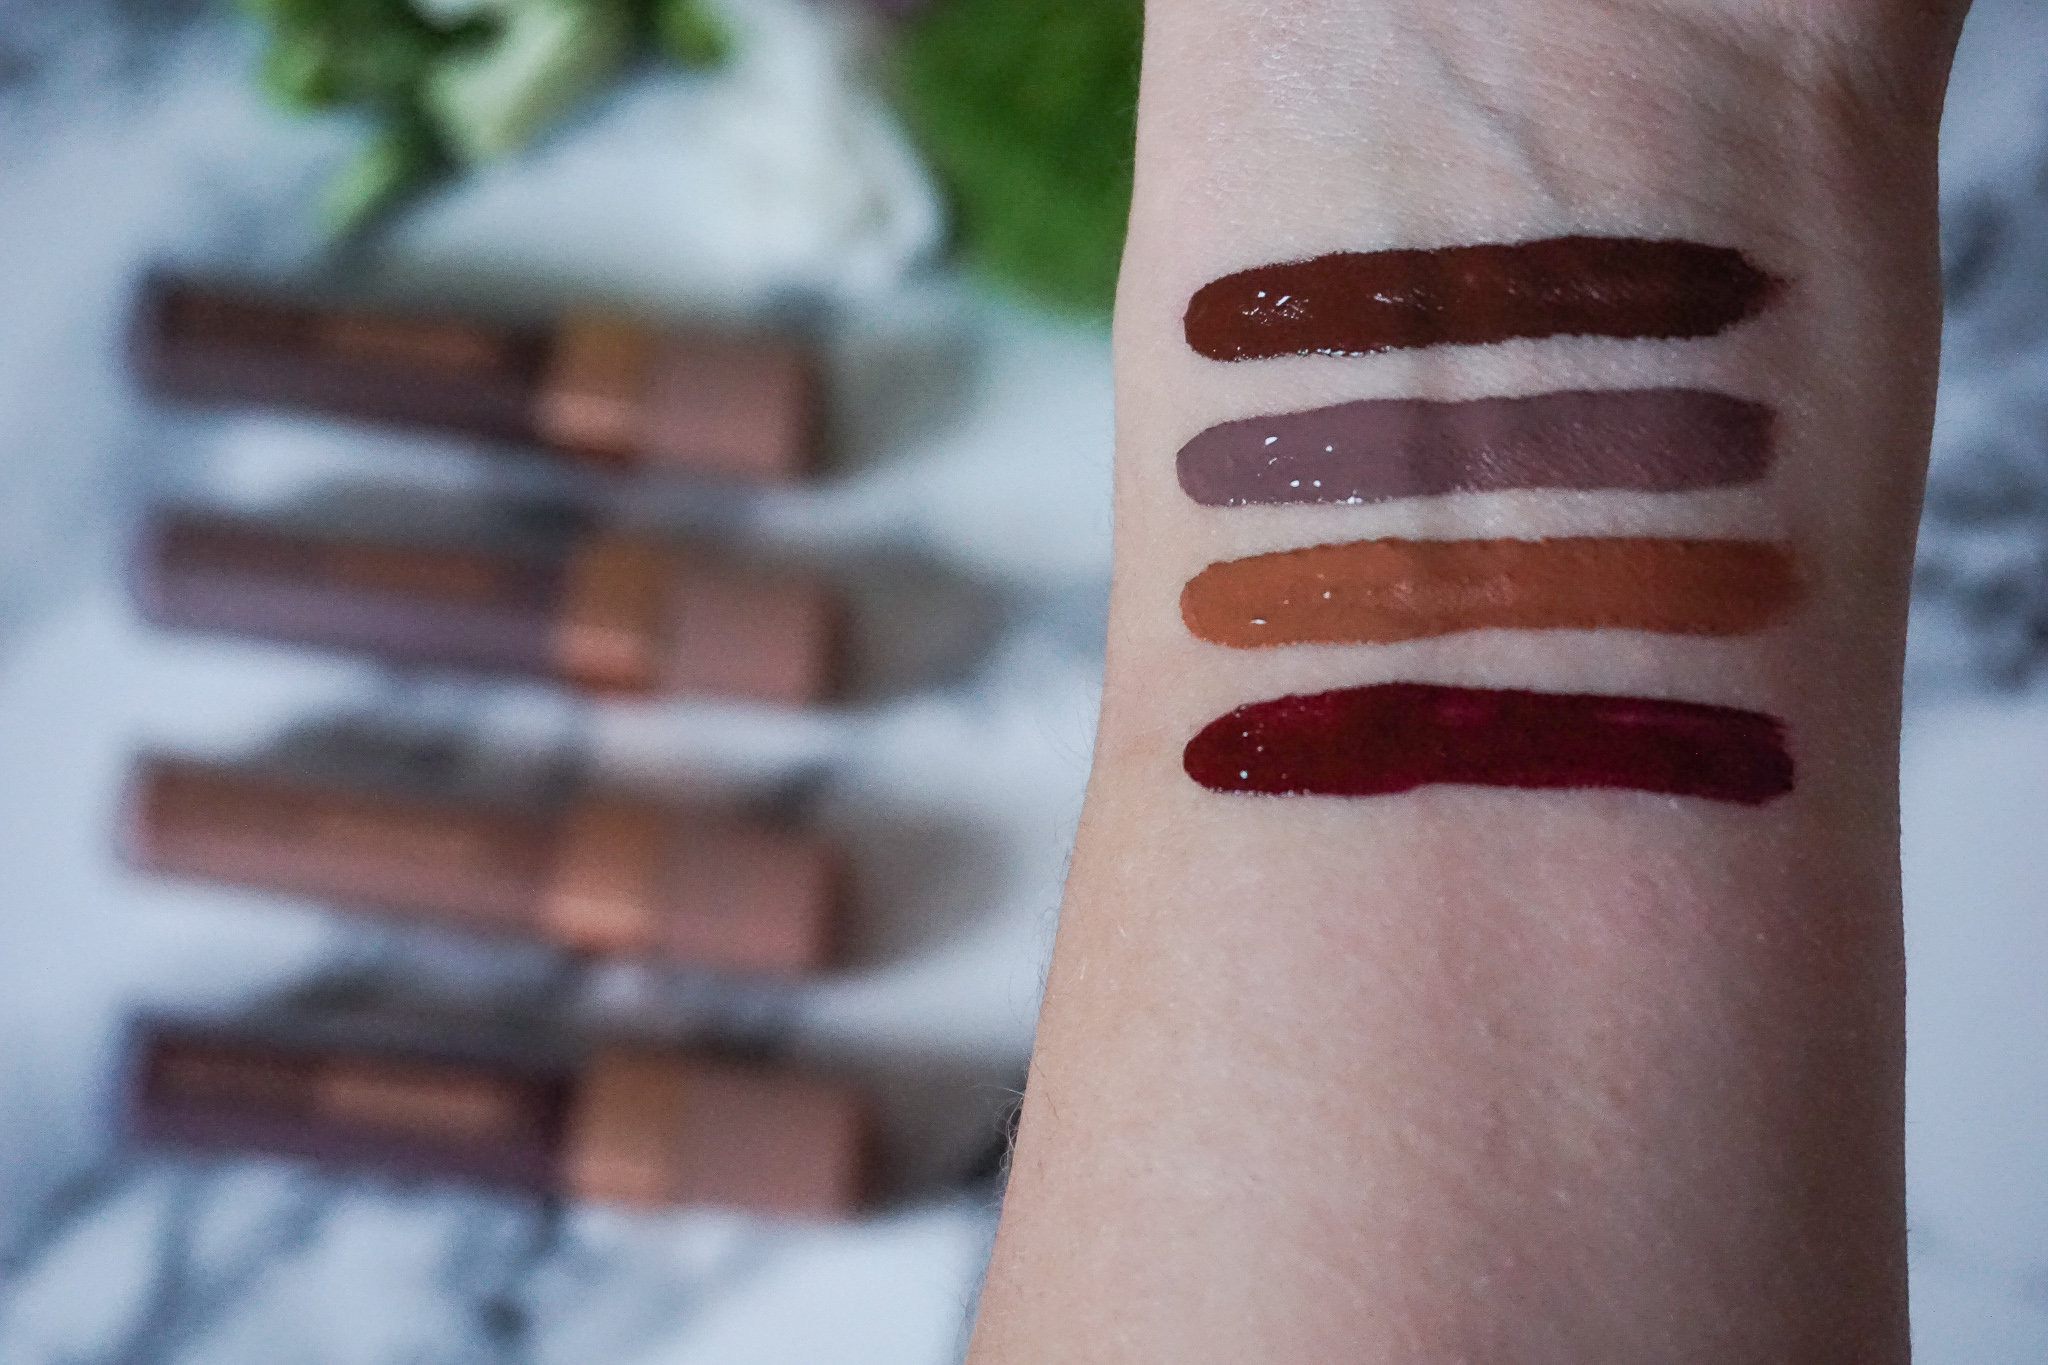 L'Oréal Les Chocolats Ultra Matte Liquid Lipstick Review Swatches